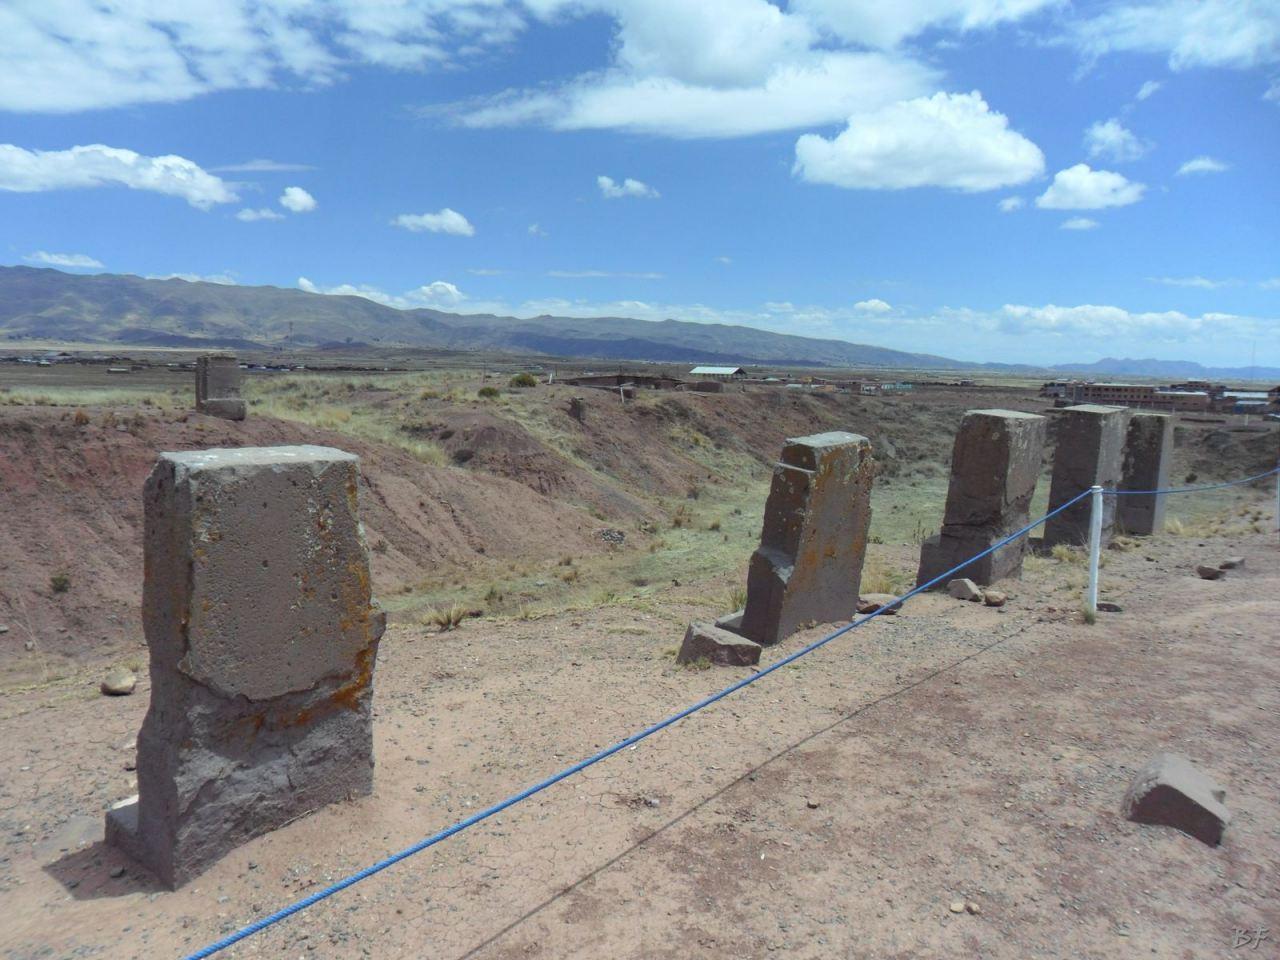 Sito-Megalitico-Piramide-Akapana-Kalasasaya-Menhir-Tiahuanaco-Bolivia-114